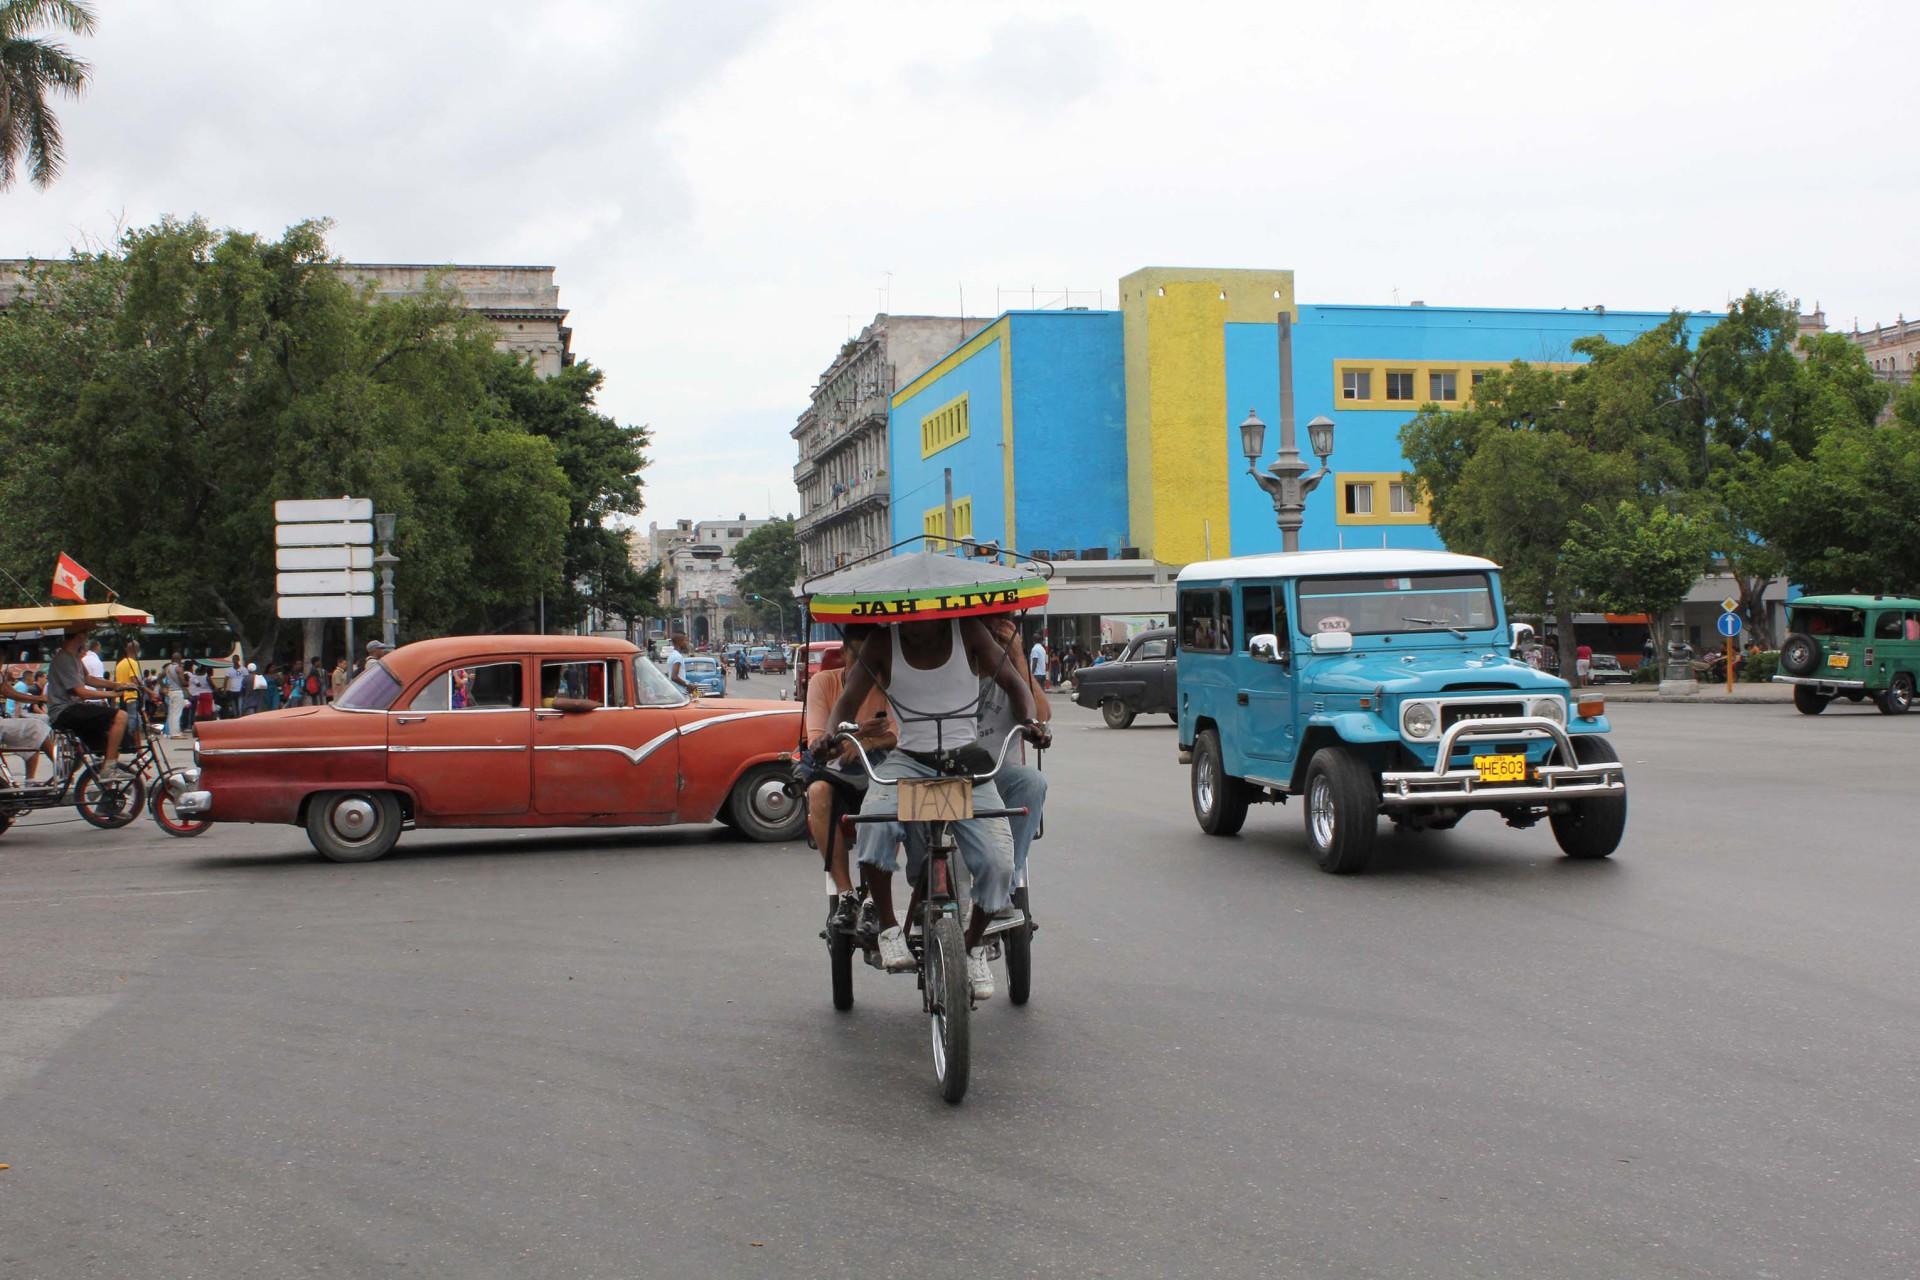 Havana Tour, 2012 | Havana Biennial